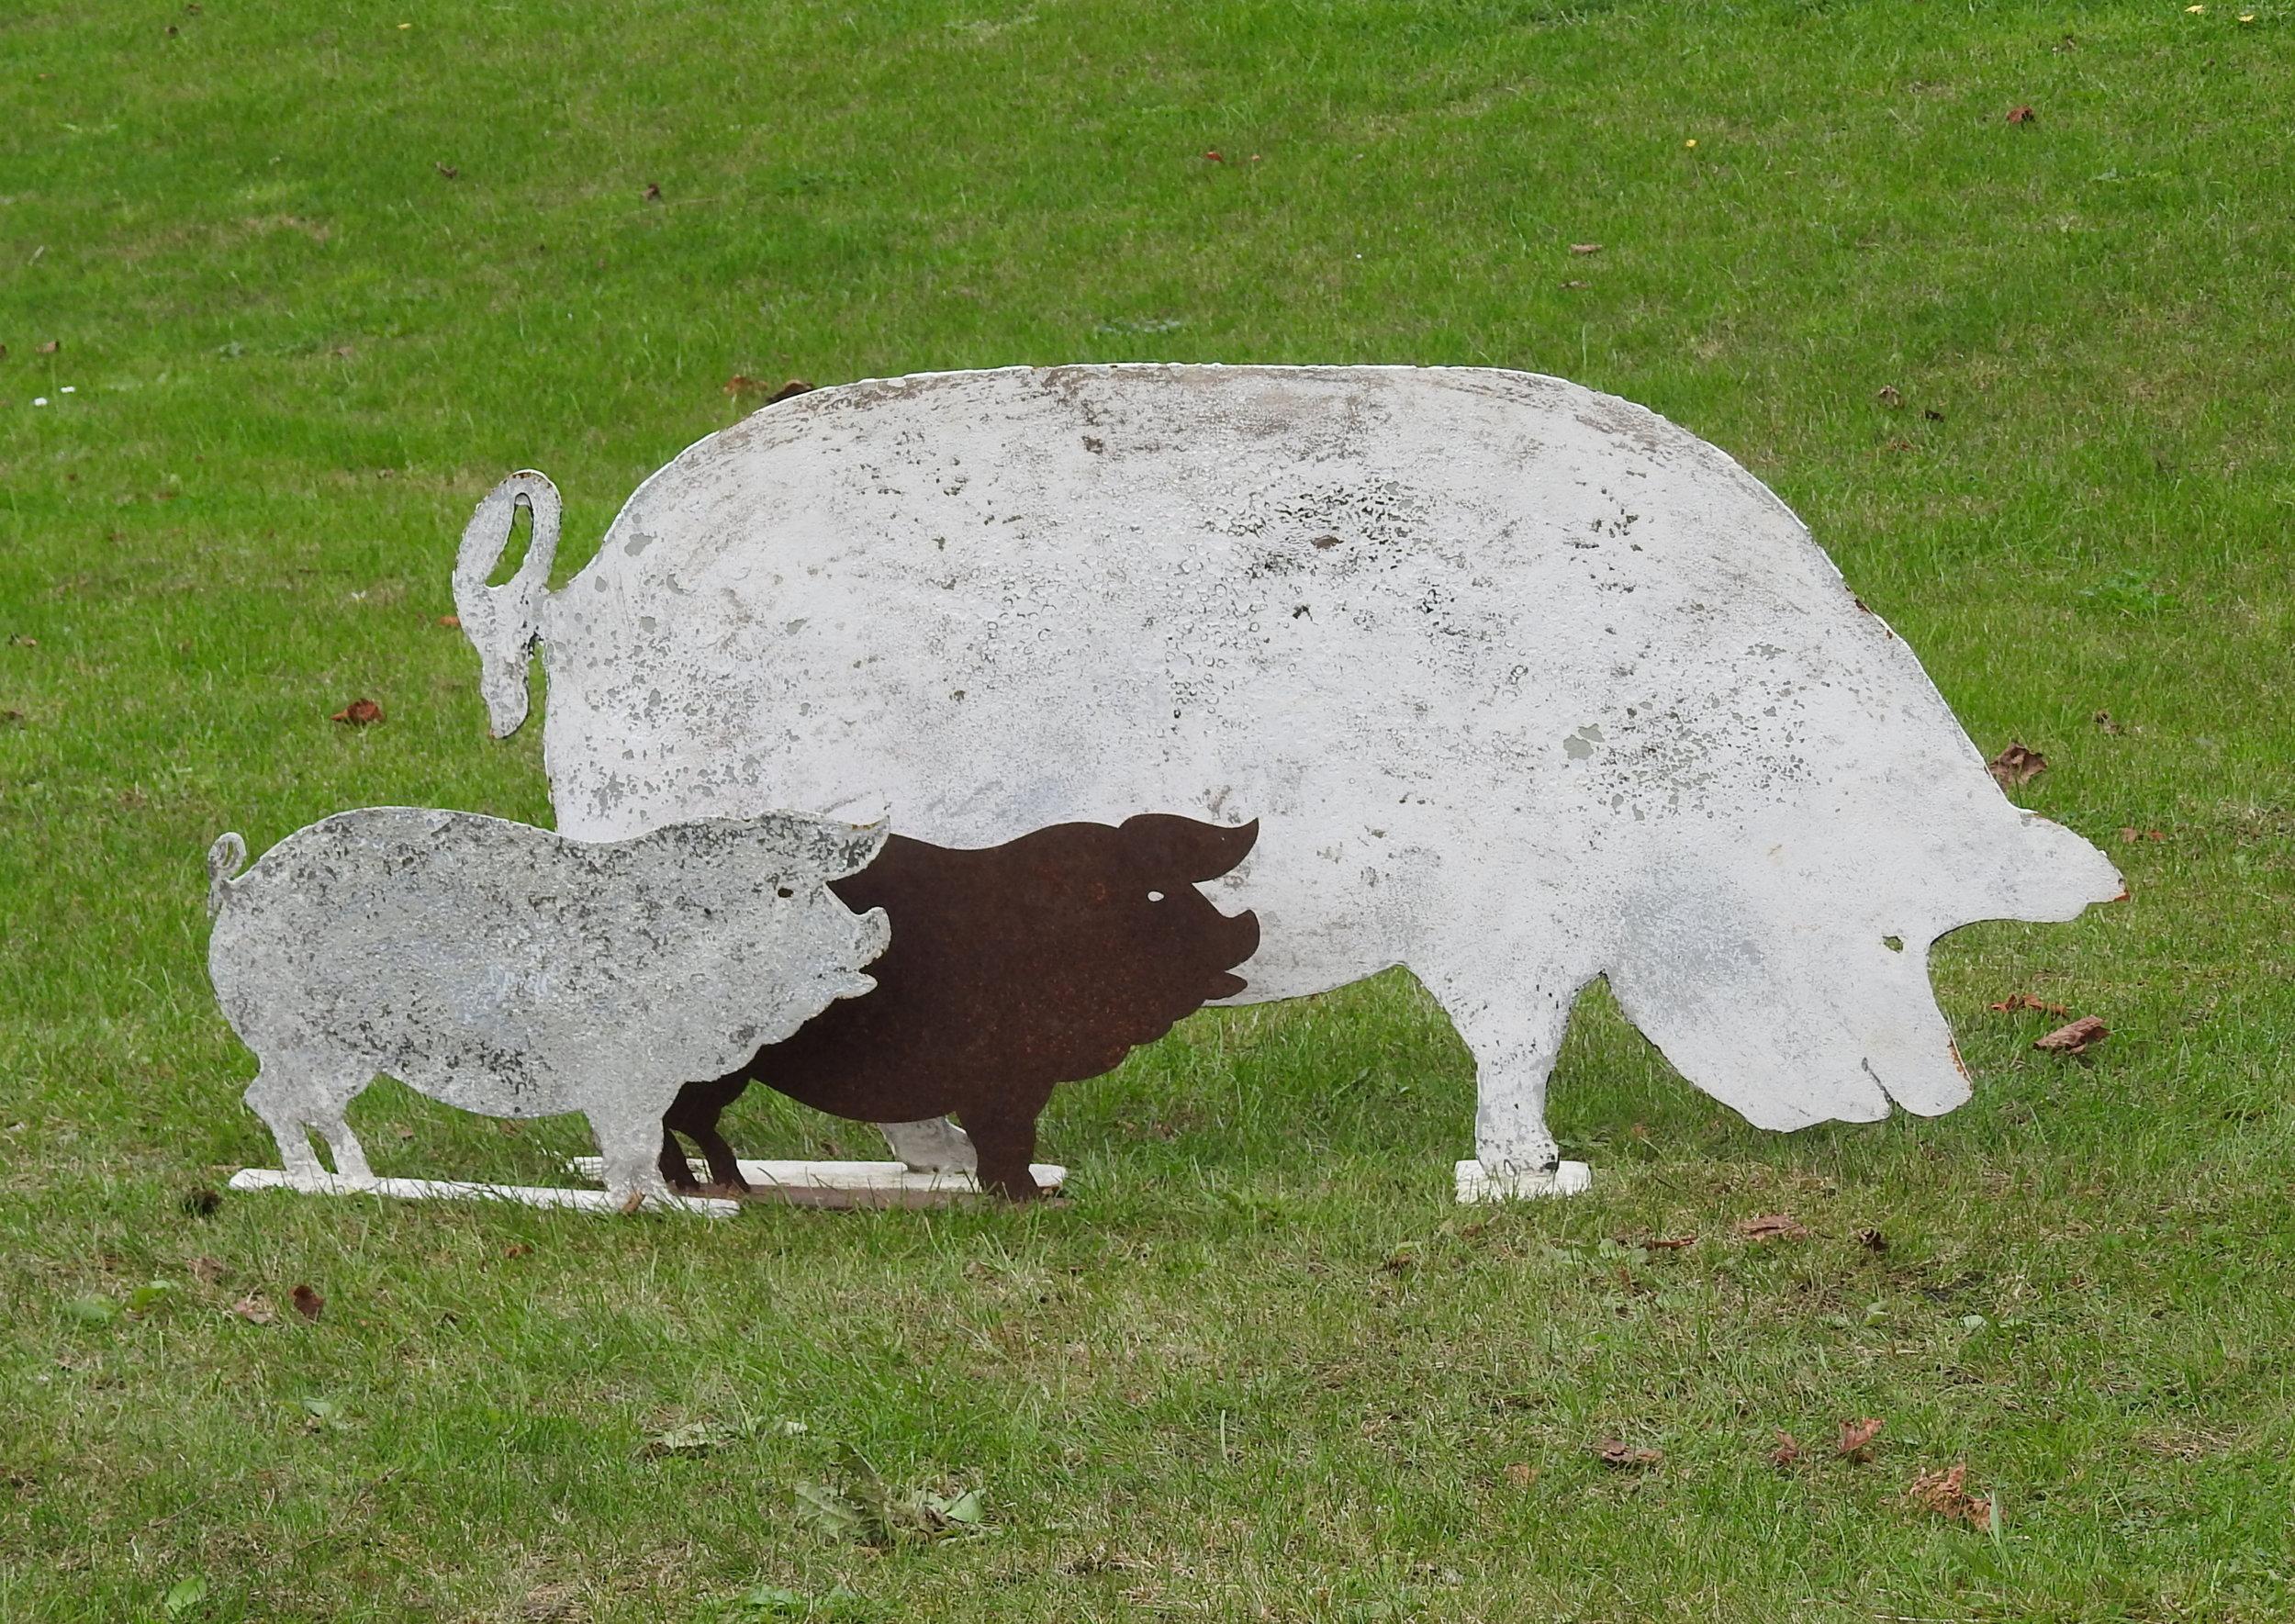 Pig with her piglets -£195 & £65 - Pig: 48 x 99cmPiglet: 25 x 40cm